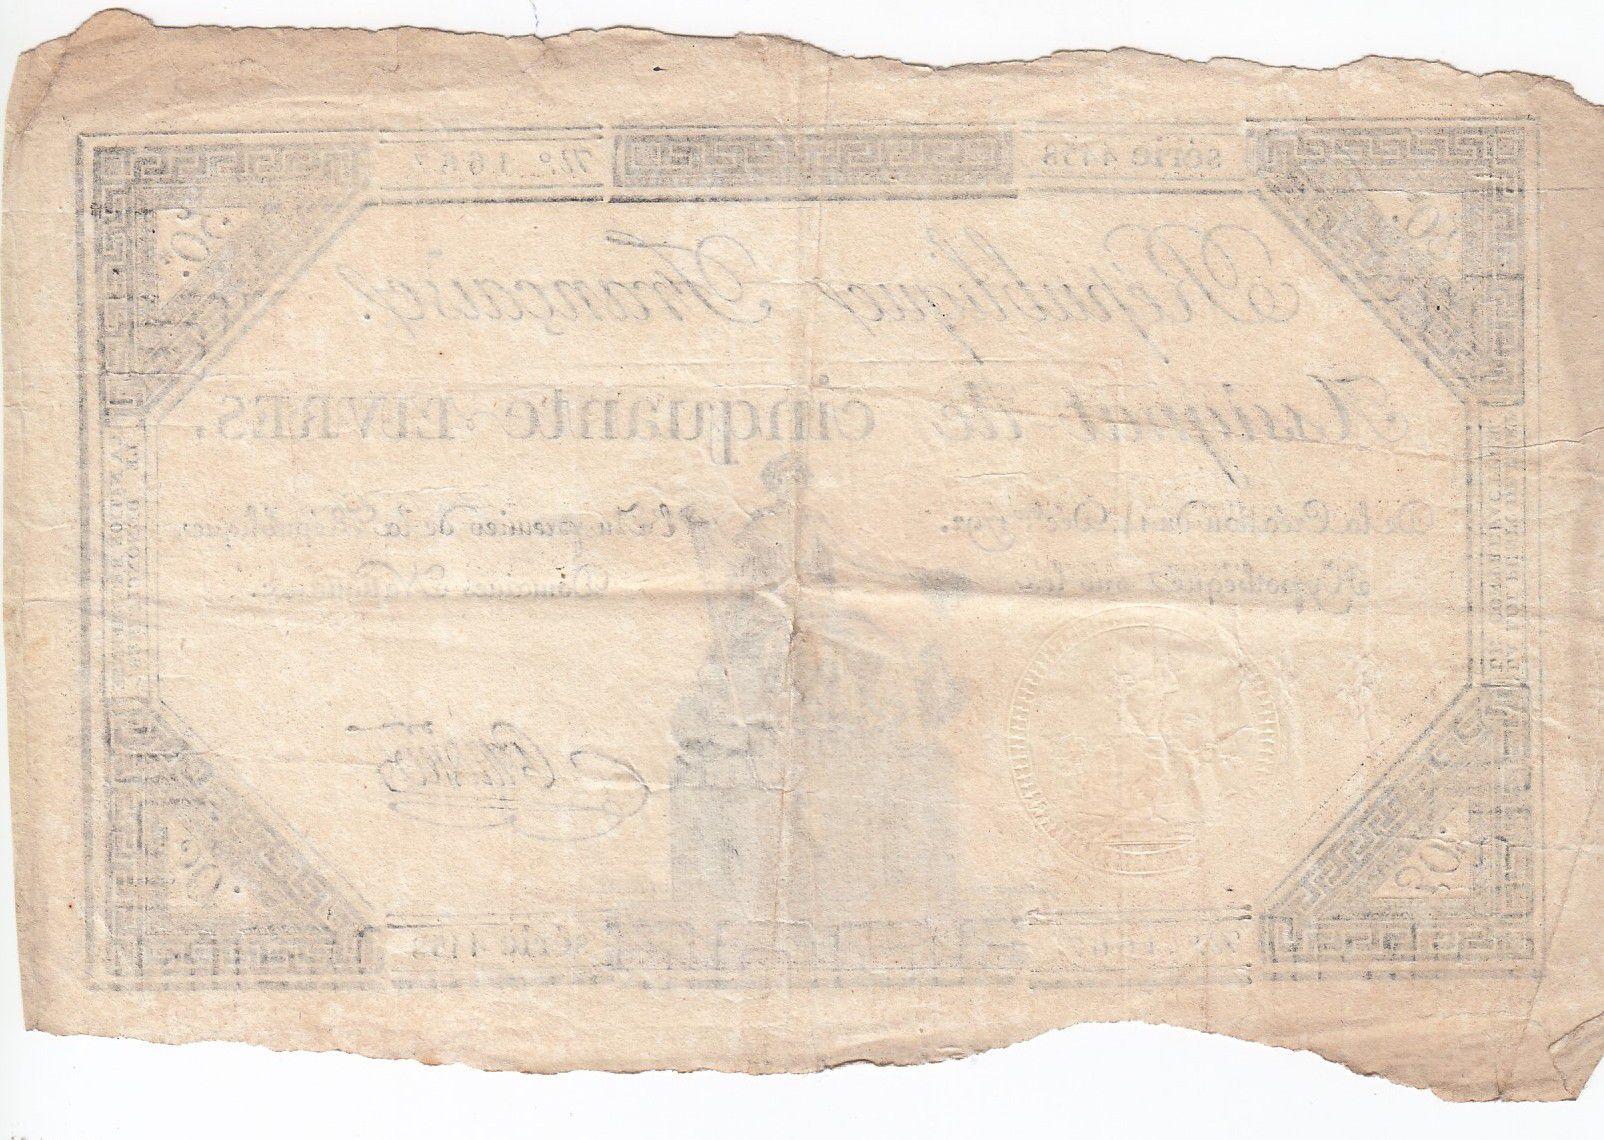 France 50 Livres France seated - 14-12-1792 - Sign. Pradier - VF